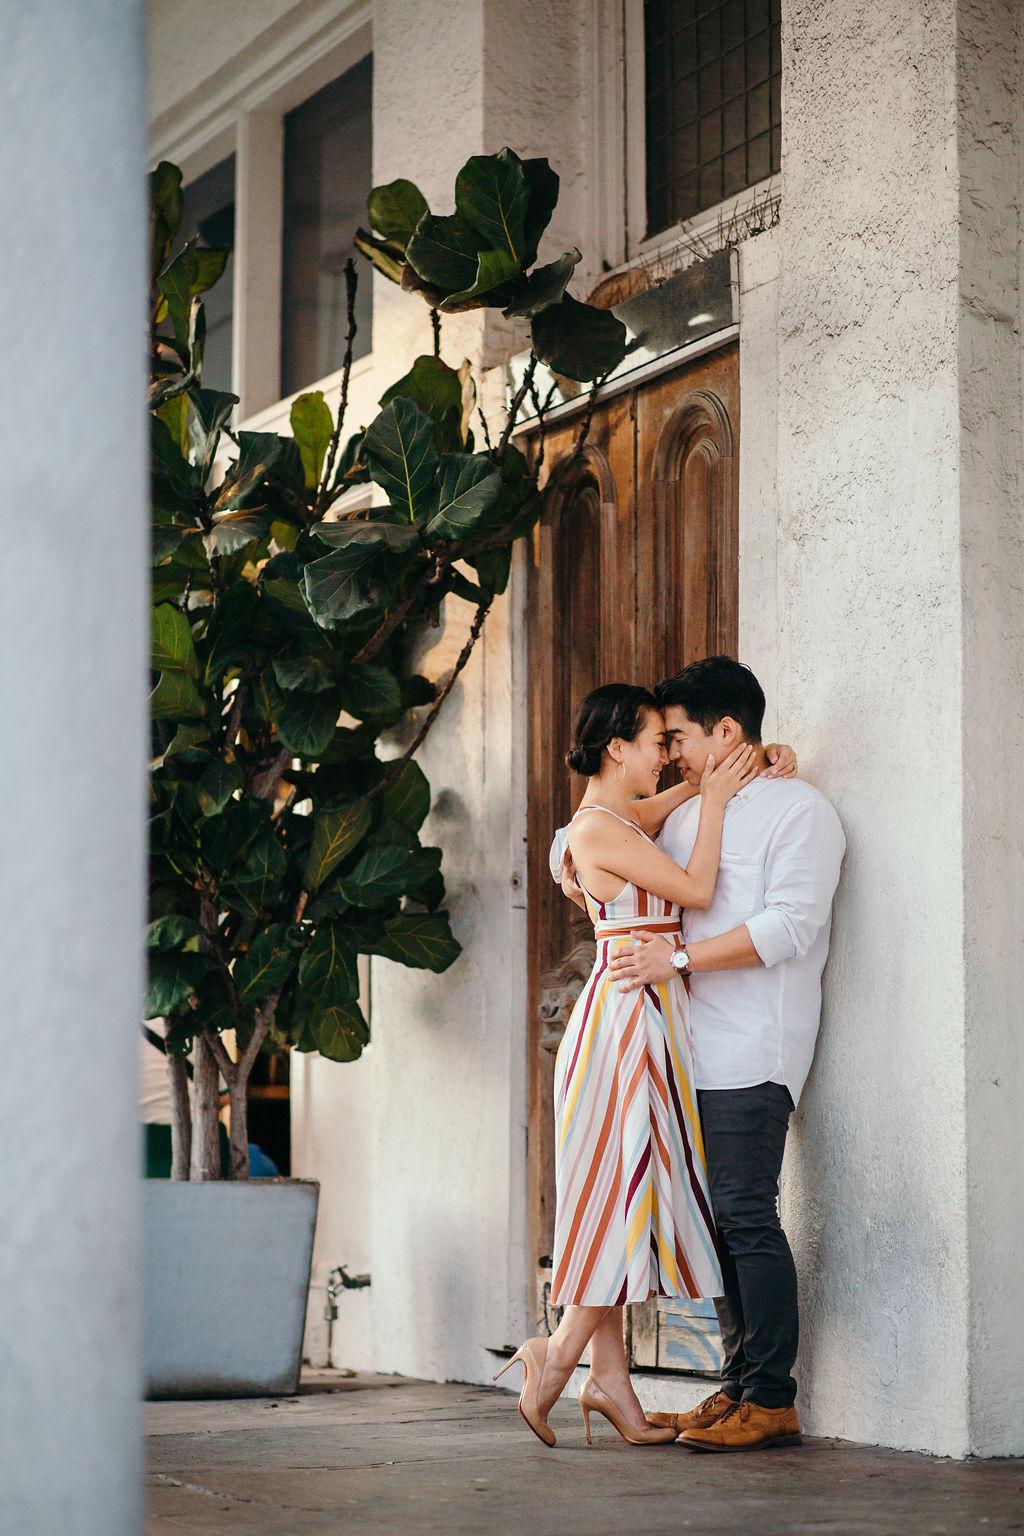 Venice Beach Engagement Photography 5 Los Angeles Orange County Wedding Photographer Joy Theory Co